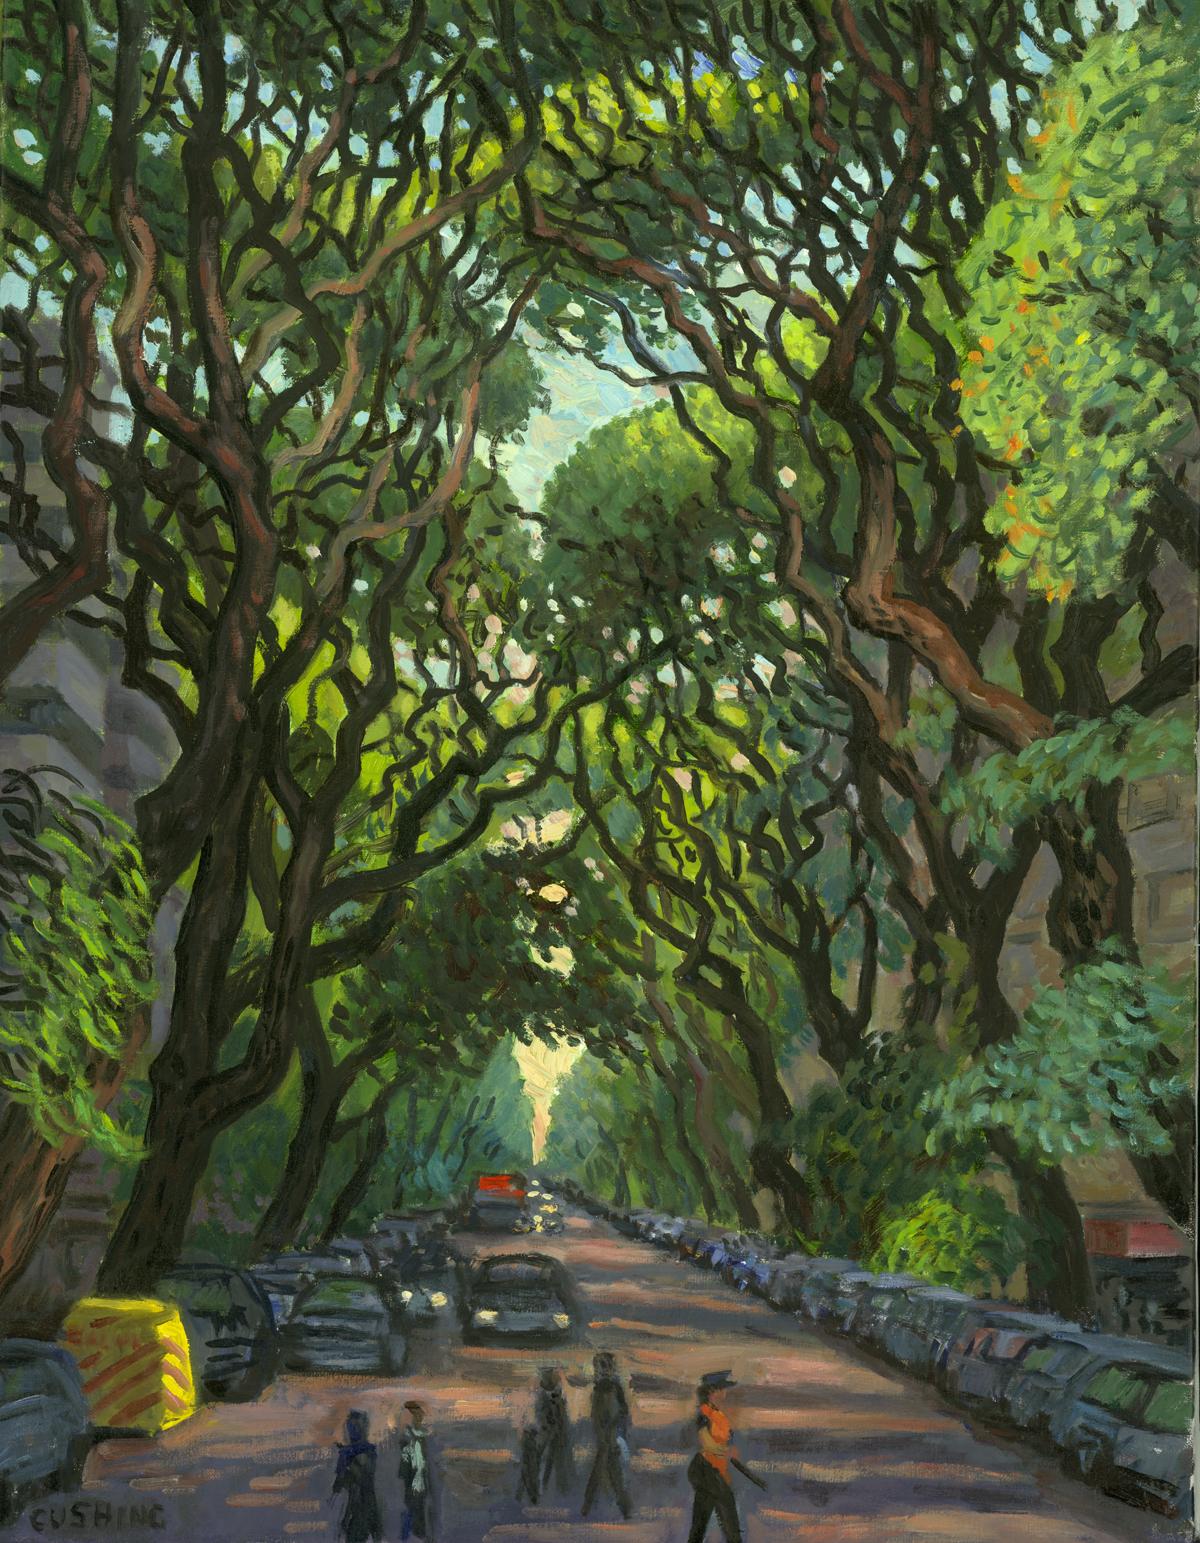 """Evening Light, Tipa Trees"" 25 x 21"" $1750.00"